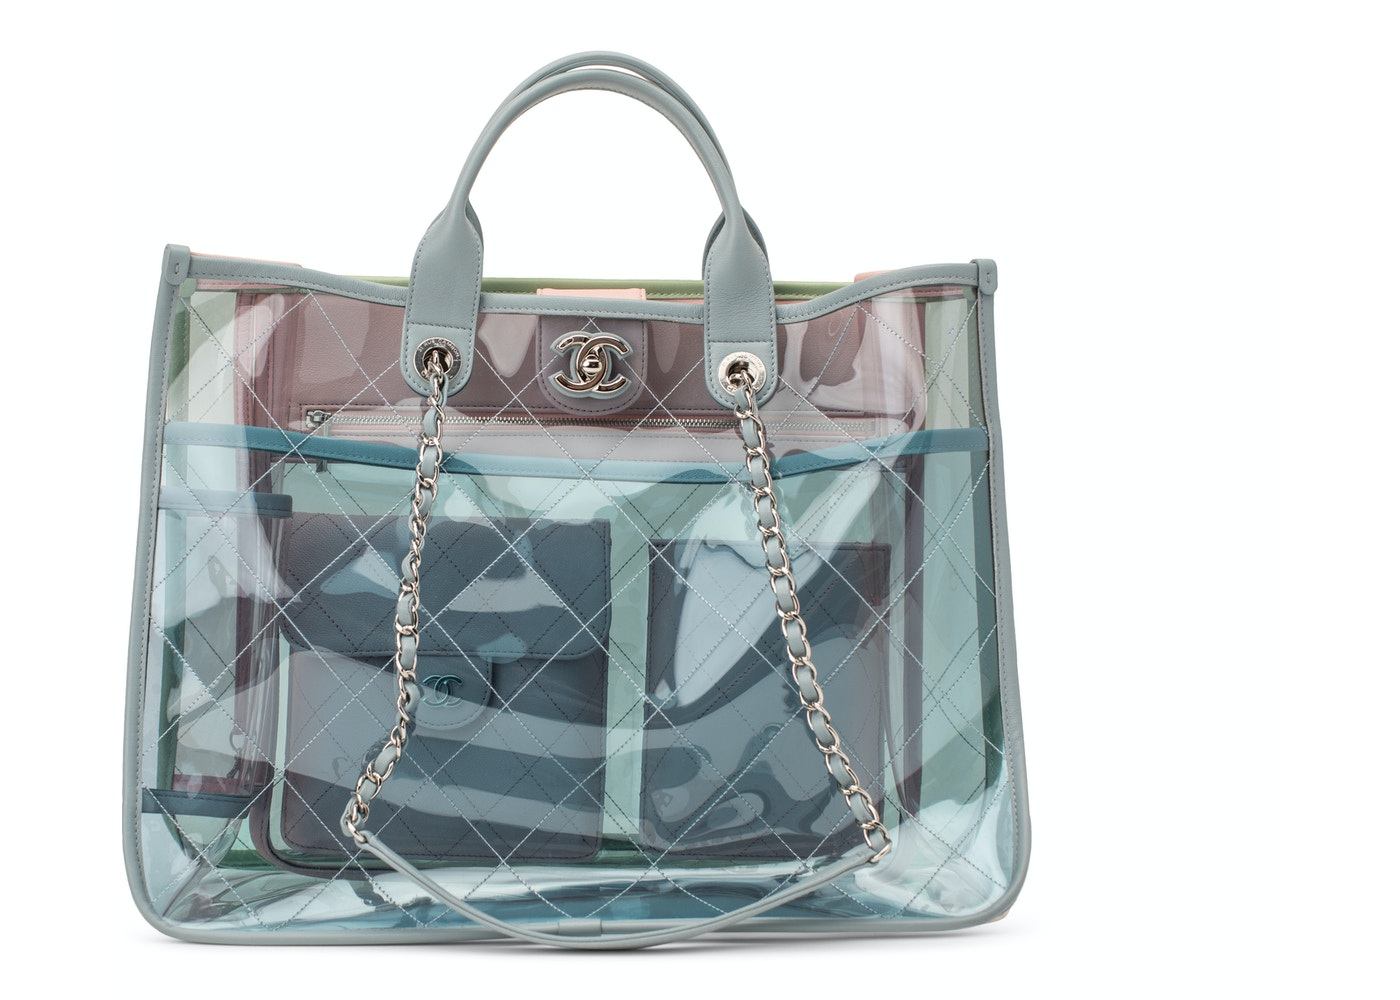 557fa4b945c7 Chanel Shopper PVC Quilted Coco Splash Medium Blue/Green/Pink